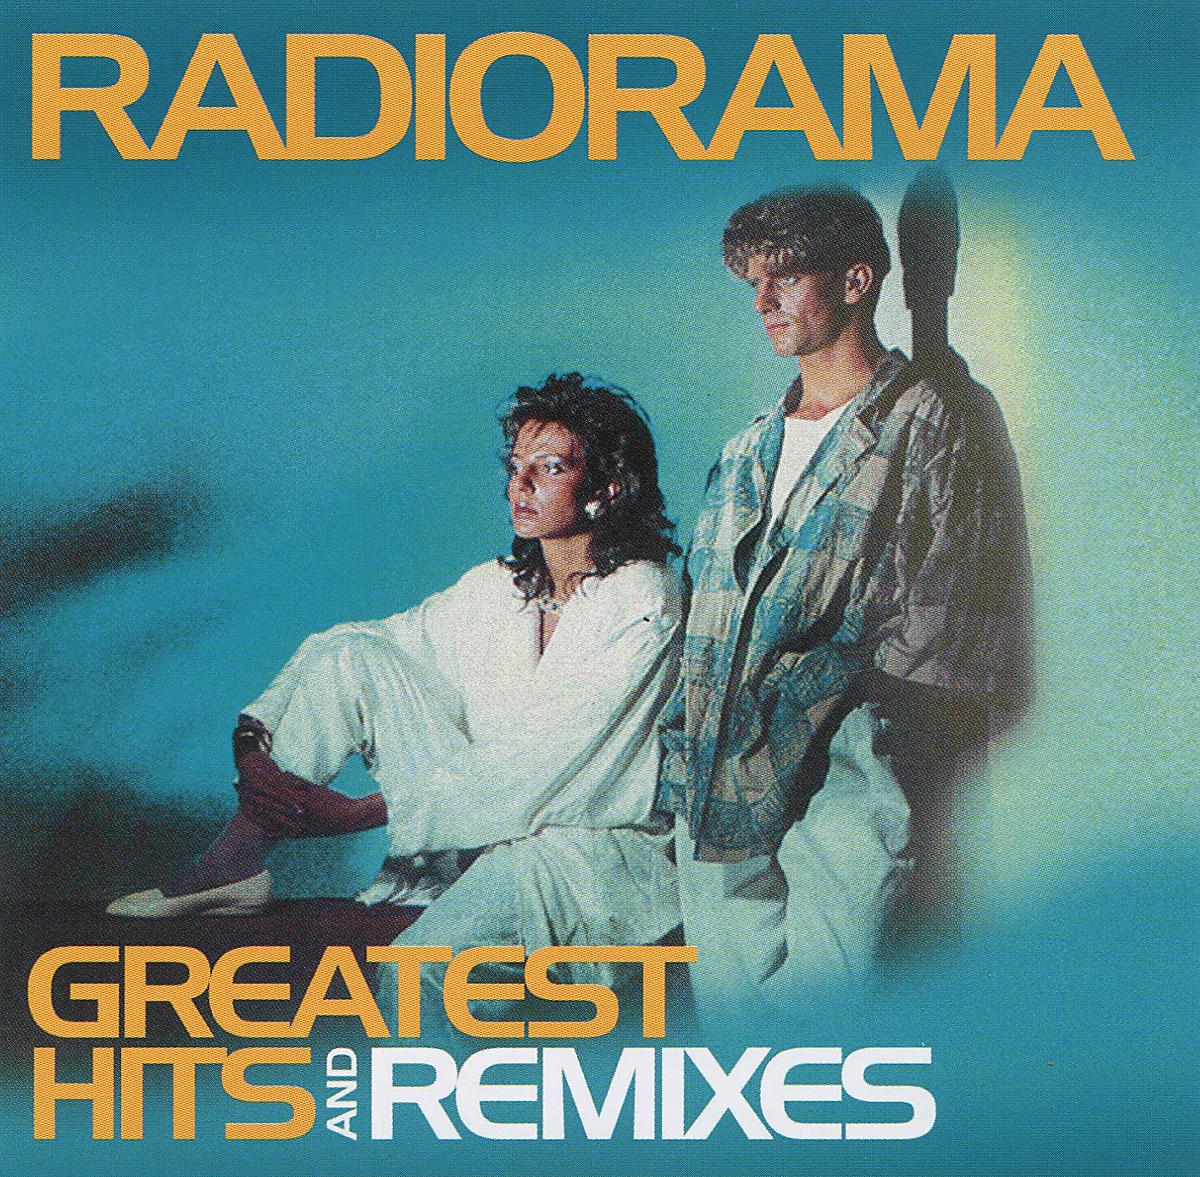 Radiorama Radiorama. Greatest Hits & Remixes (2 CD) scotch scotch greatest hits remixes